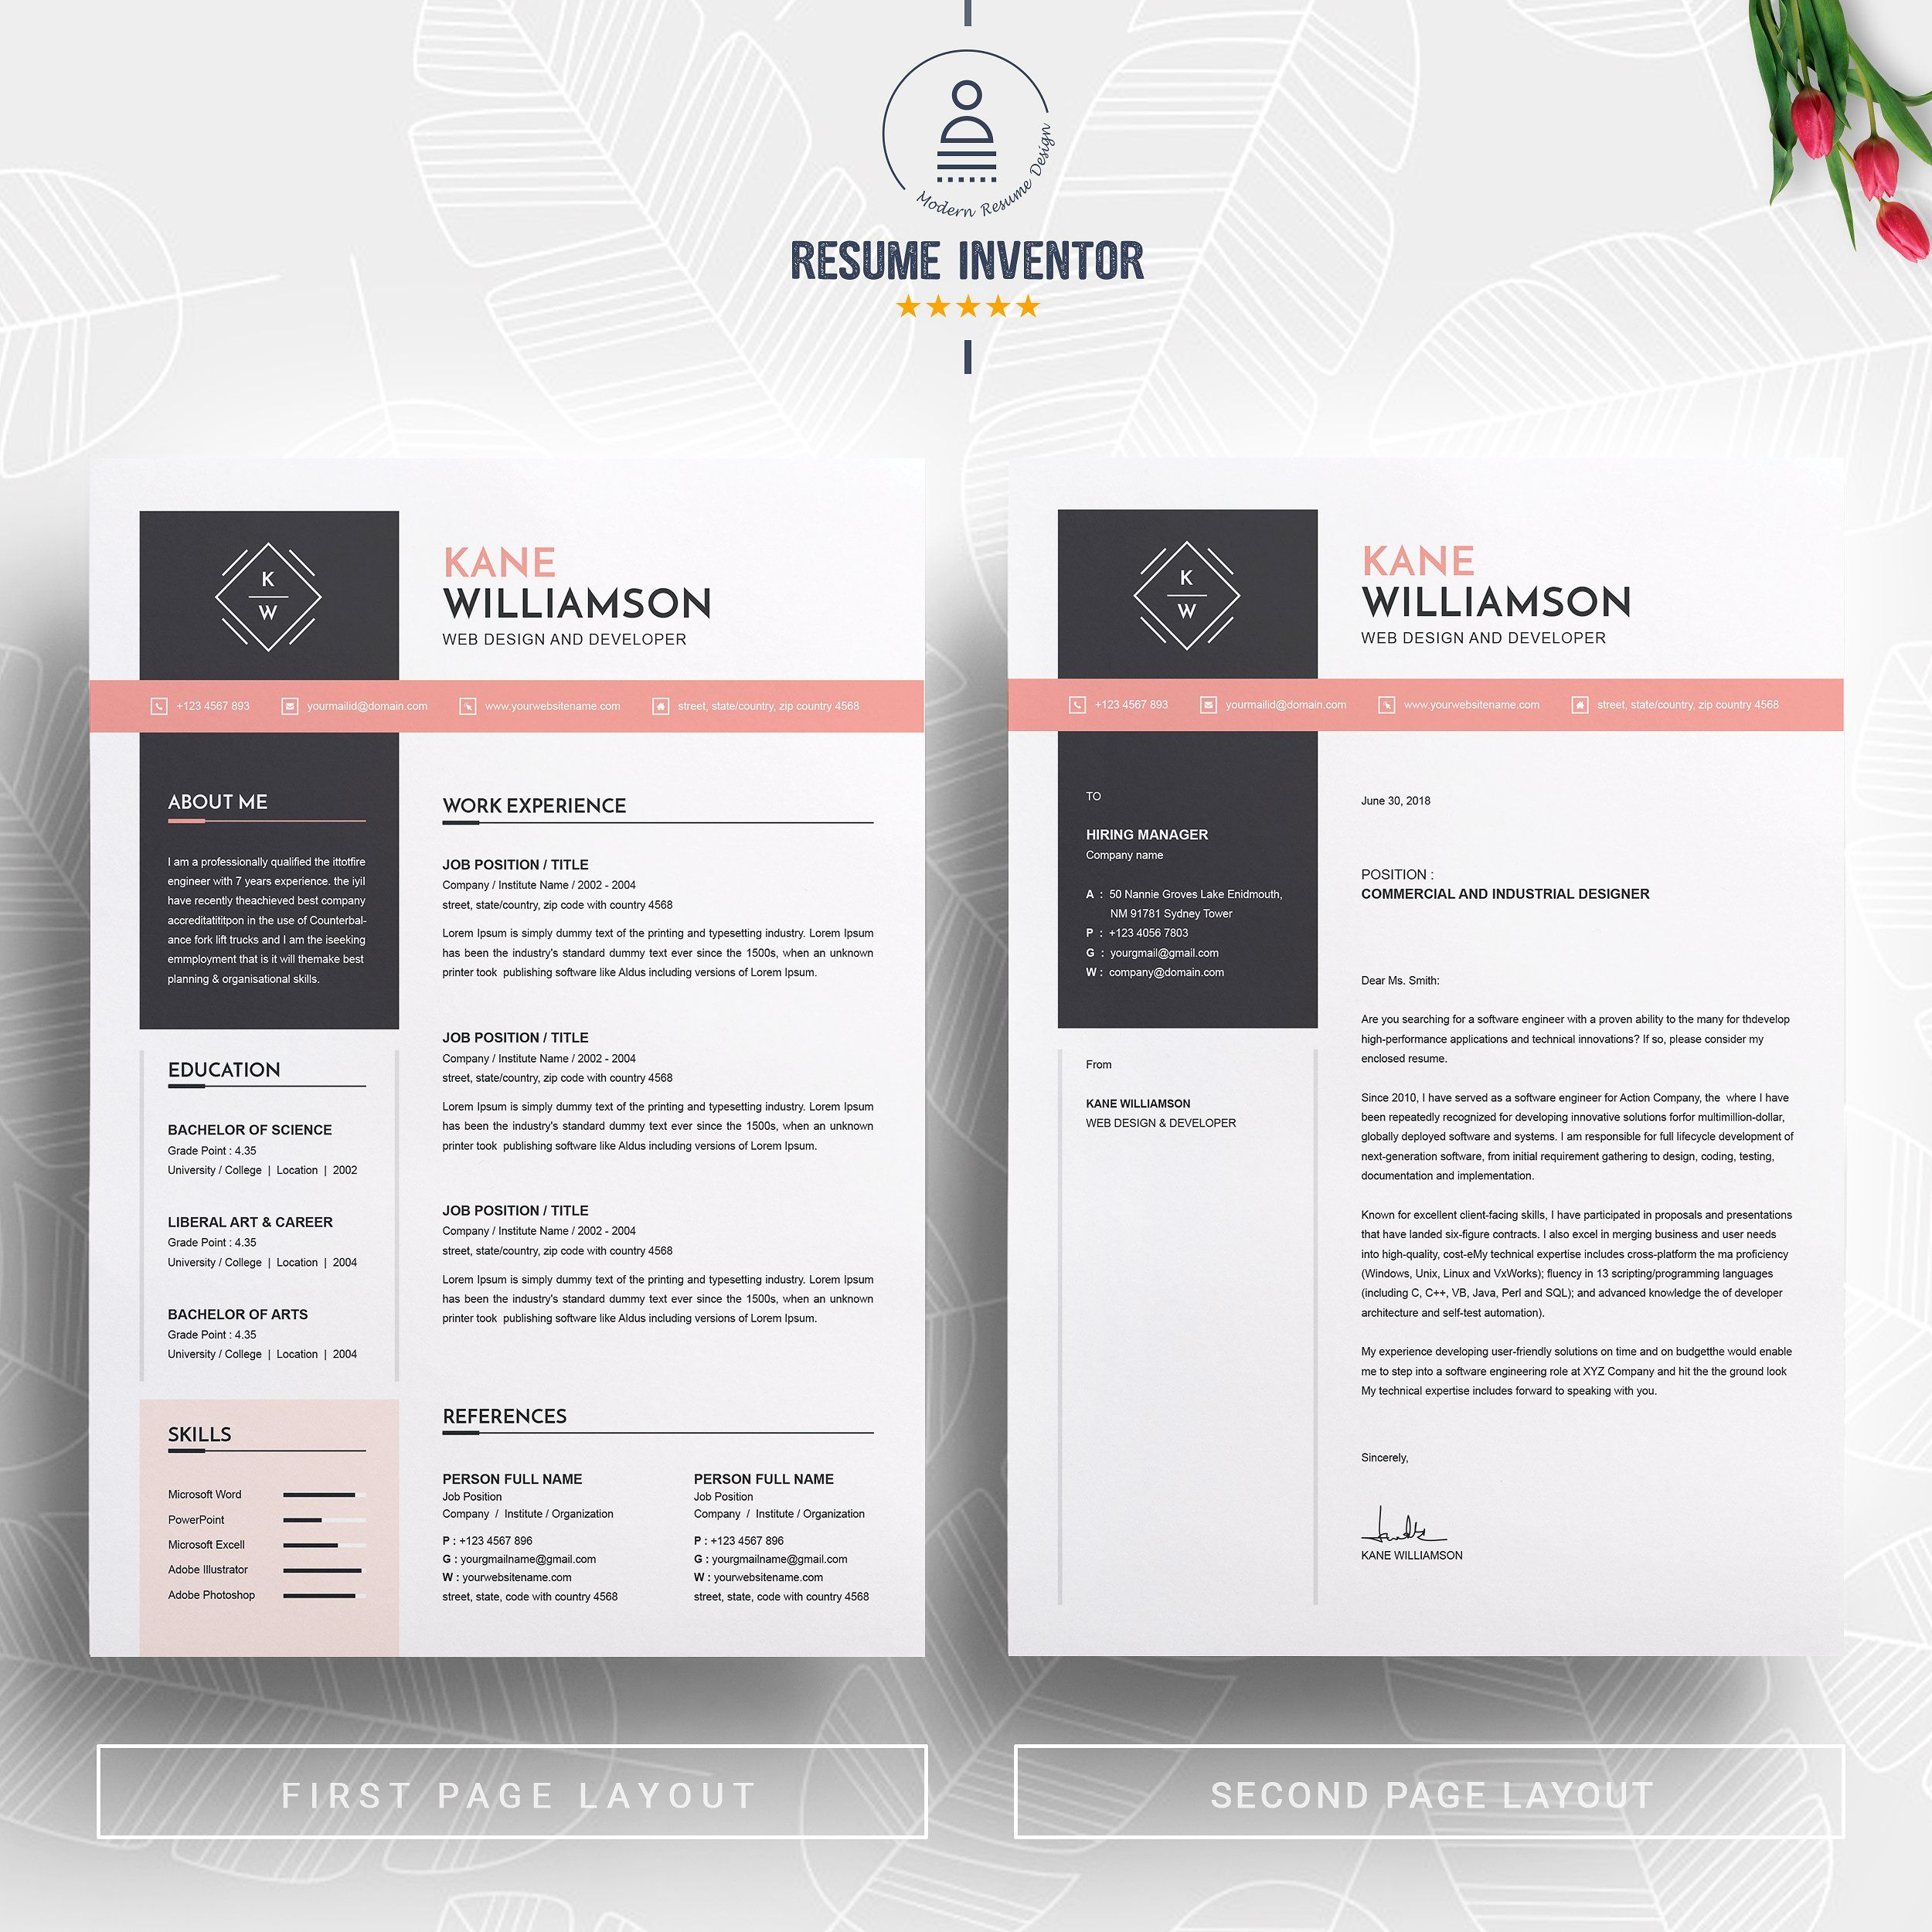 Professional Resume Cv Template Professional Resume Cv Template Resume Cv